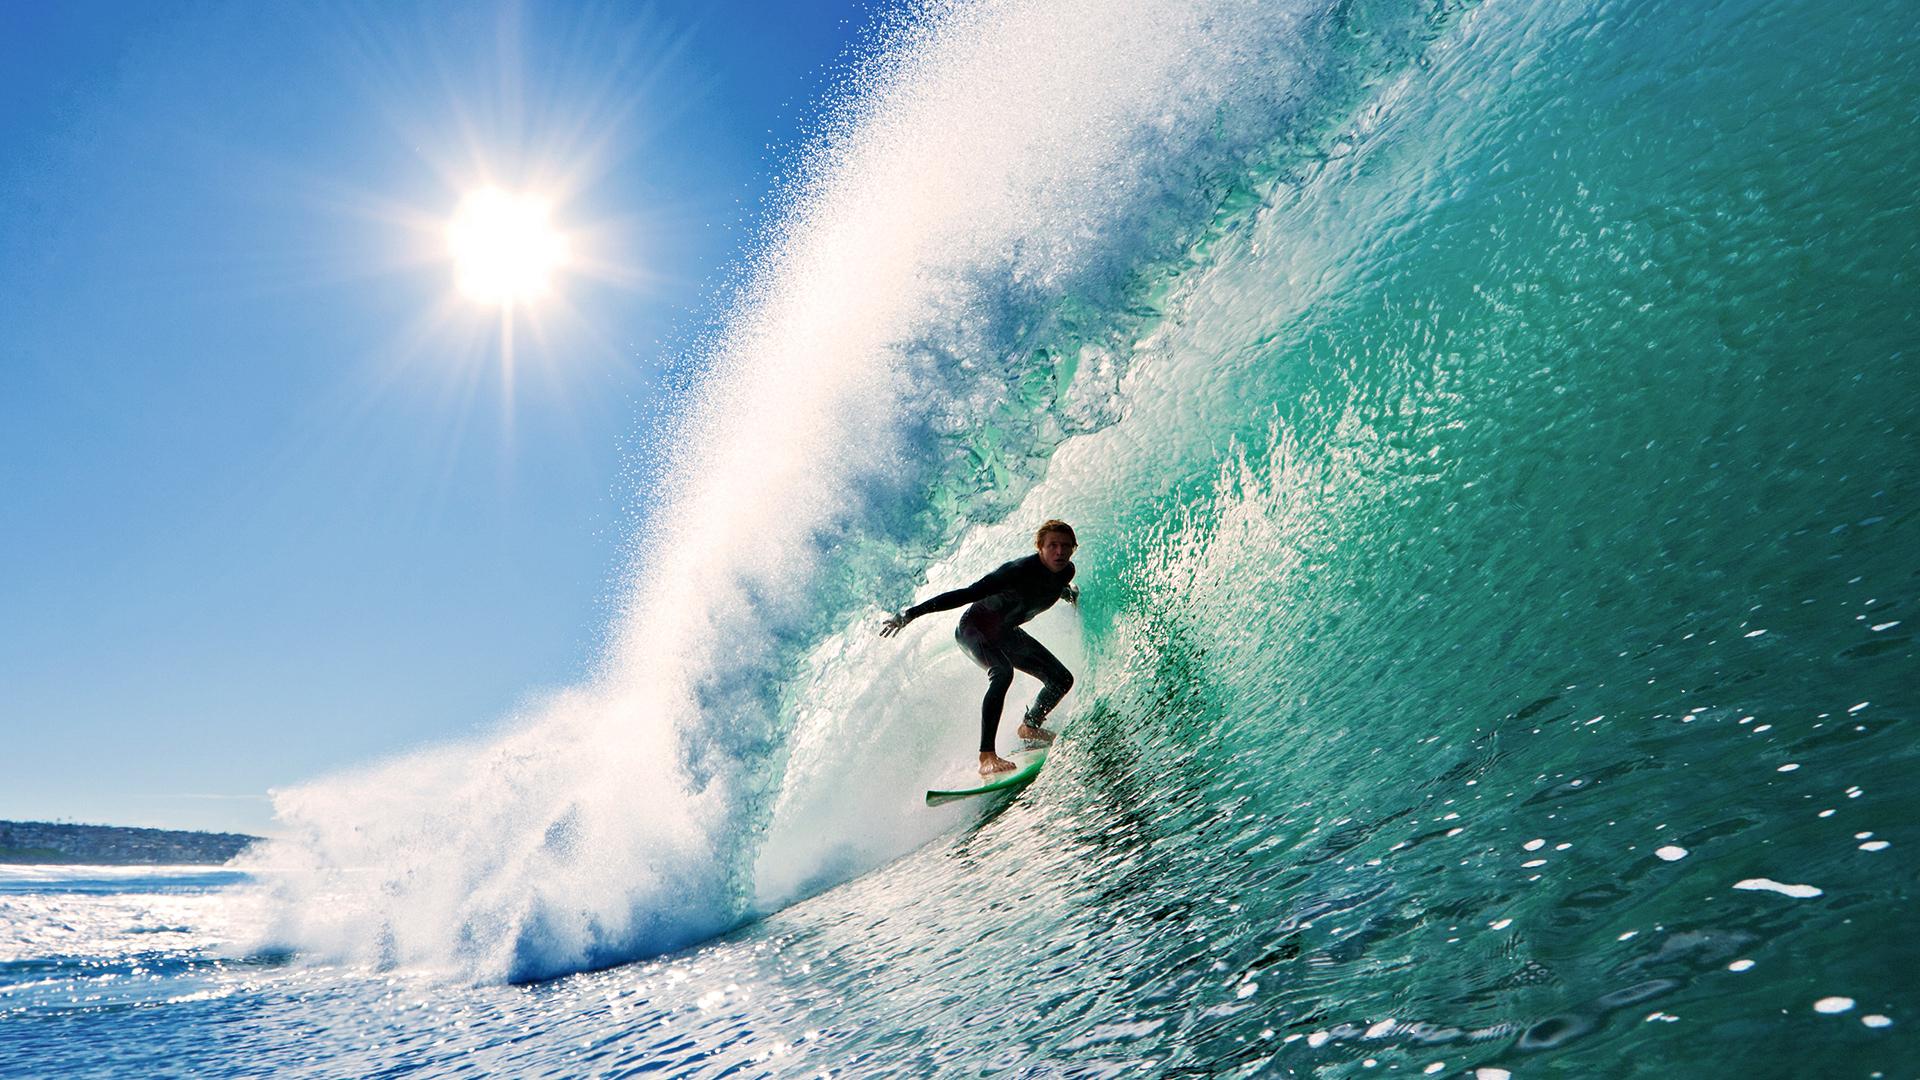 surf surfing top image surf water surfing picture surfer sport best 1920x1080